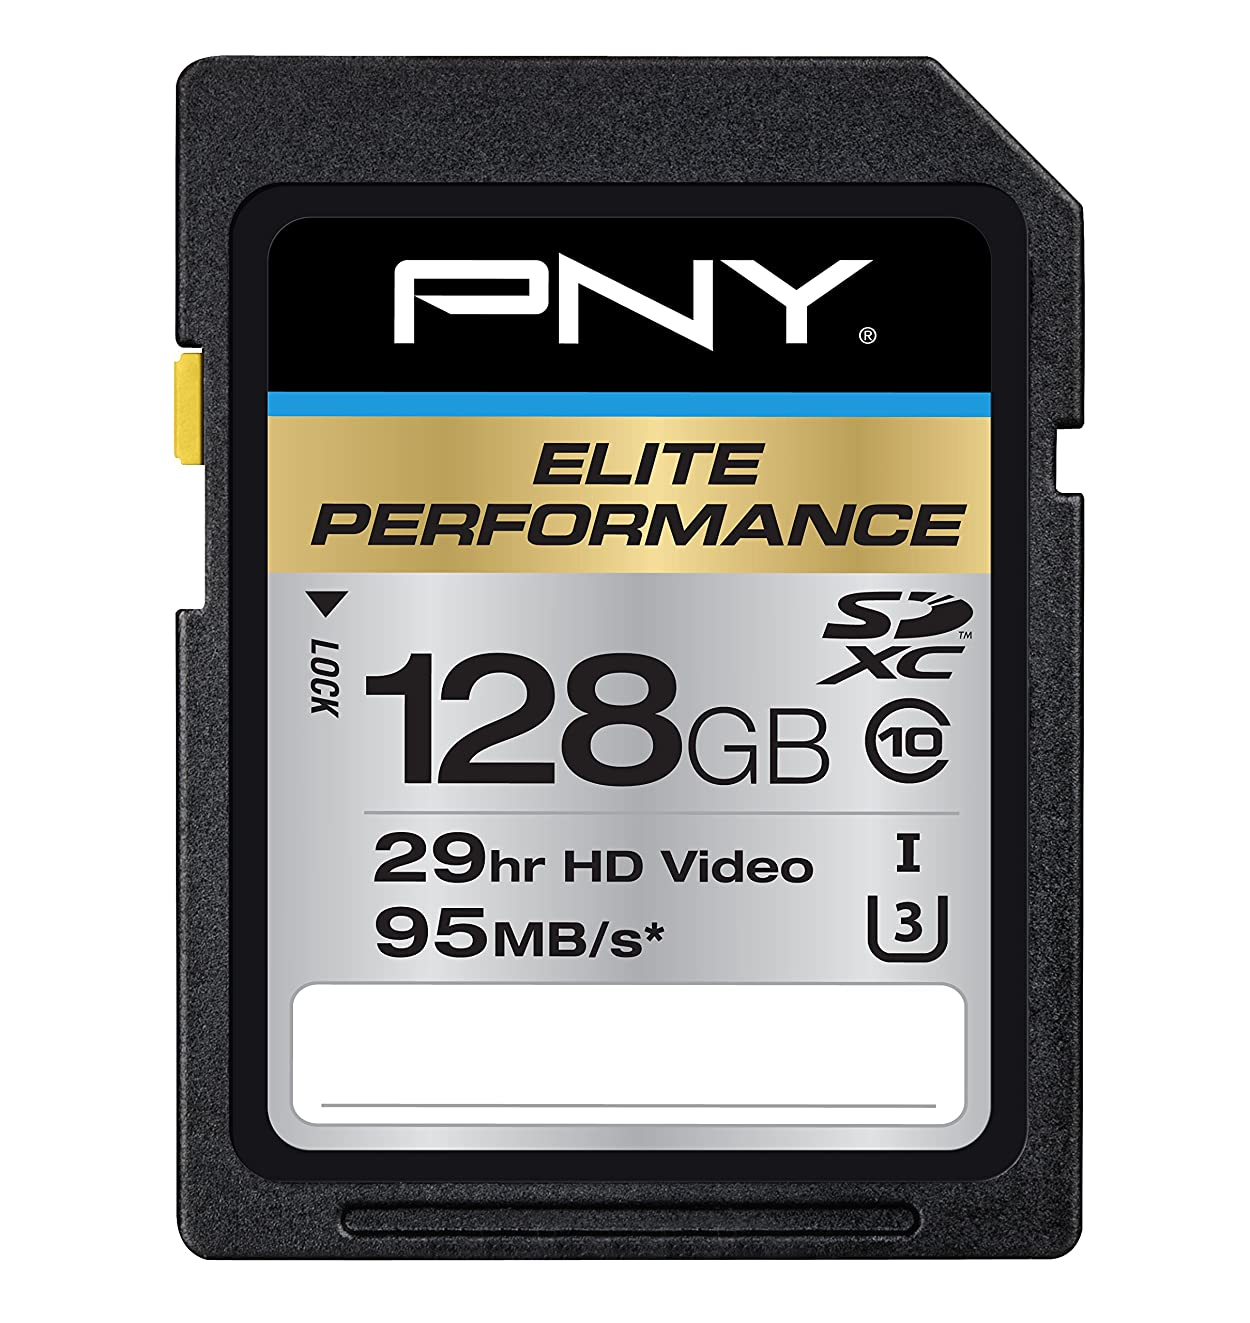 PNY P-SDX128U395-GE Elite Performance 128 GB High Speed SDXC Class 10 UHS-I, U3 Up to 95 MB/Sec Flash Card